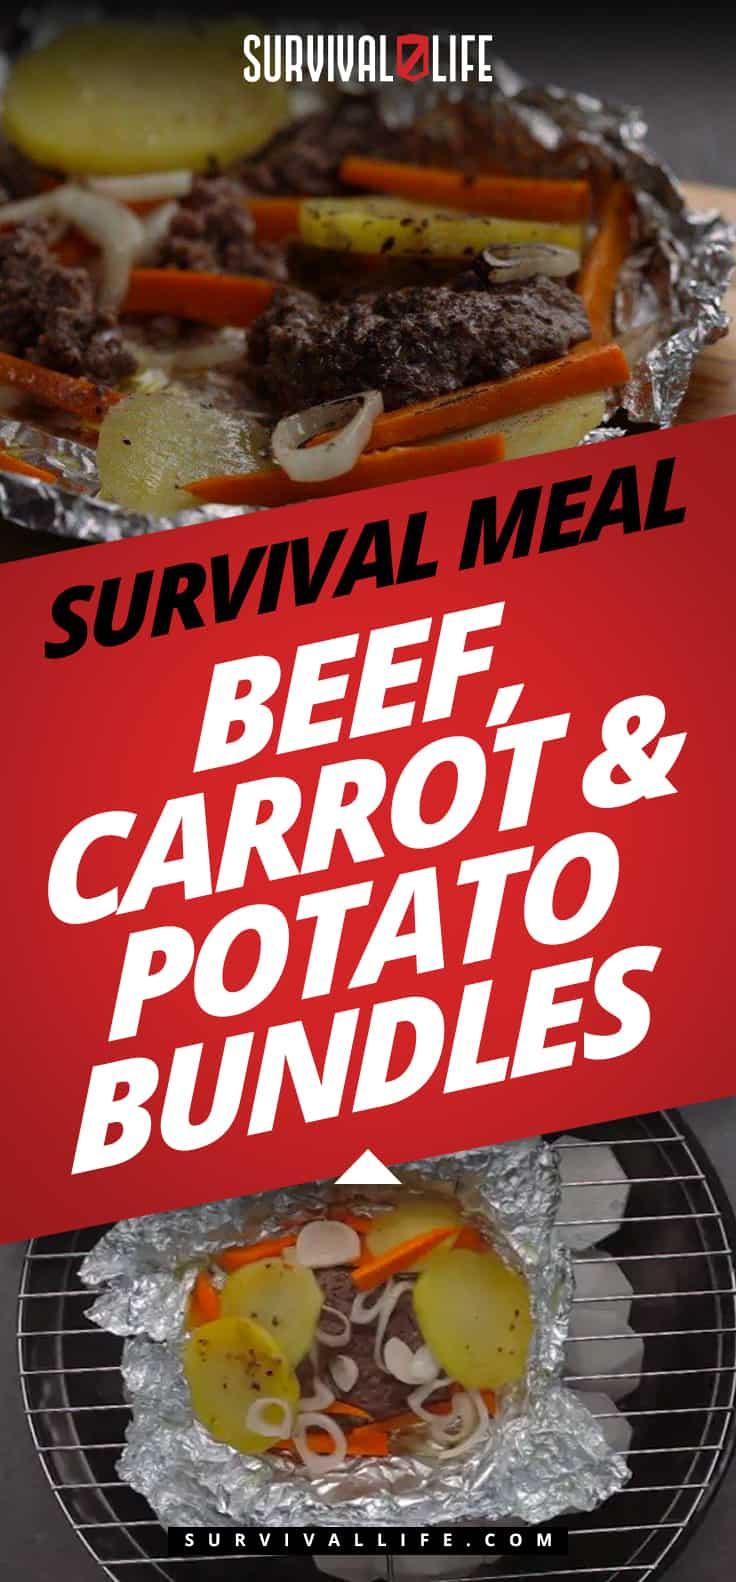 Survival Meal: Beef, Carrot & Potato Bundles